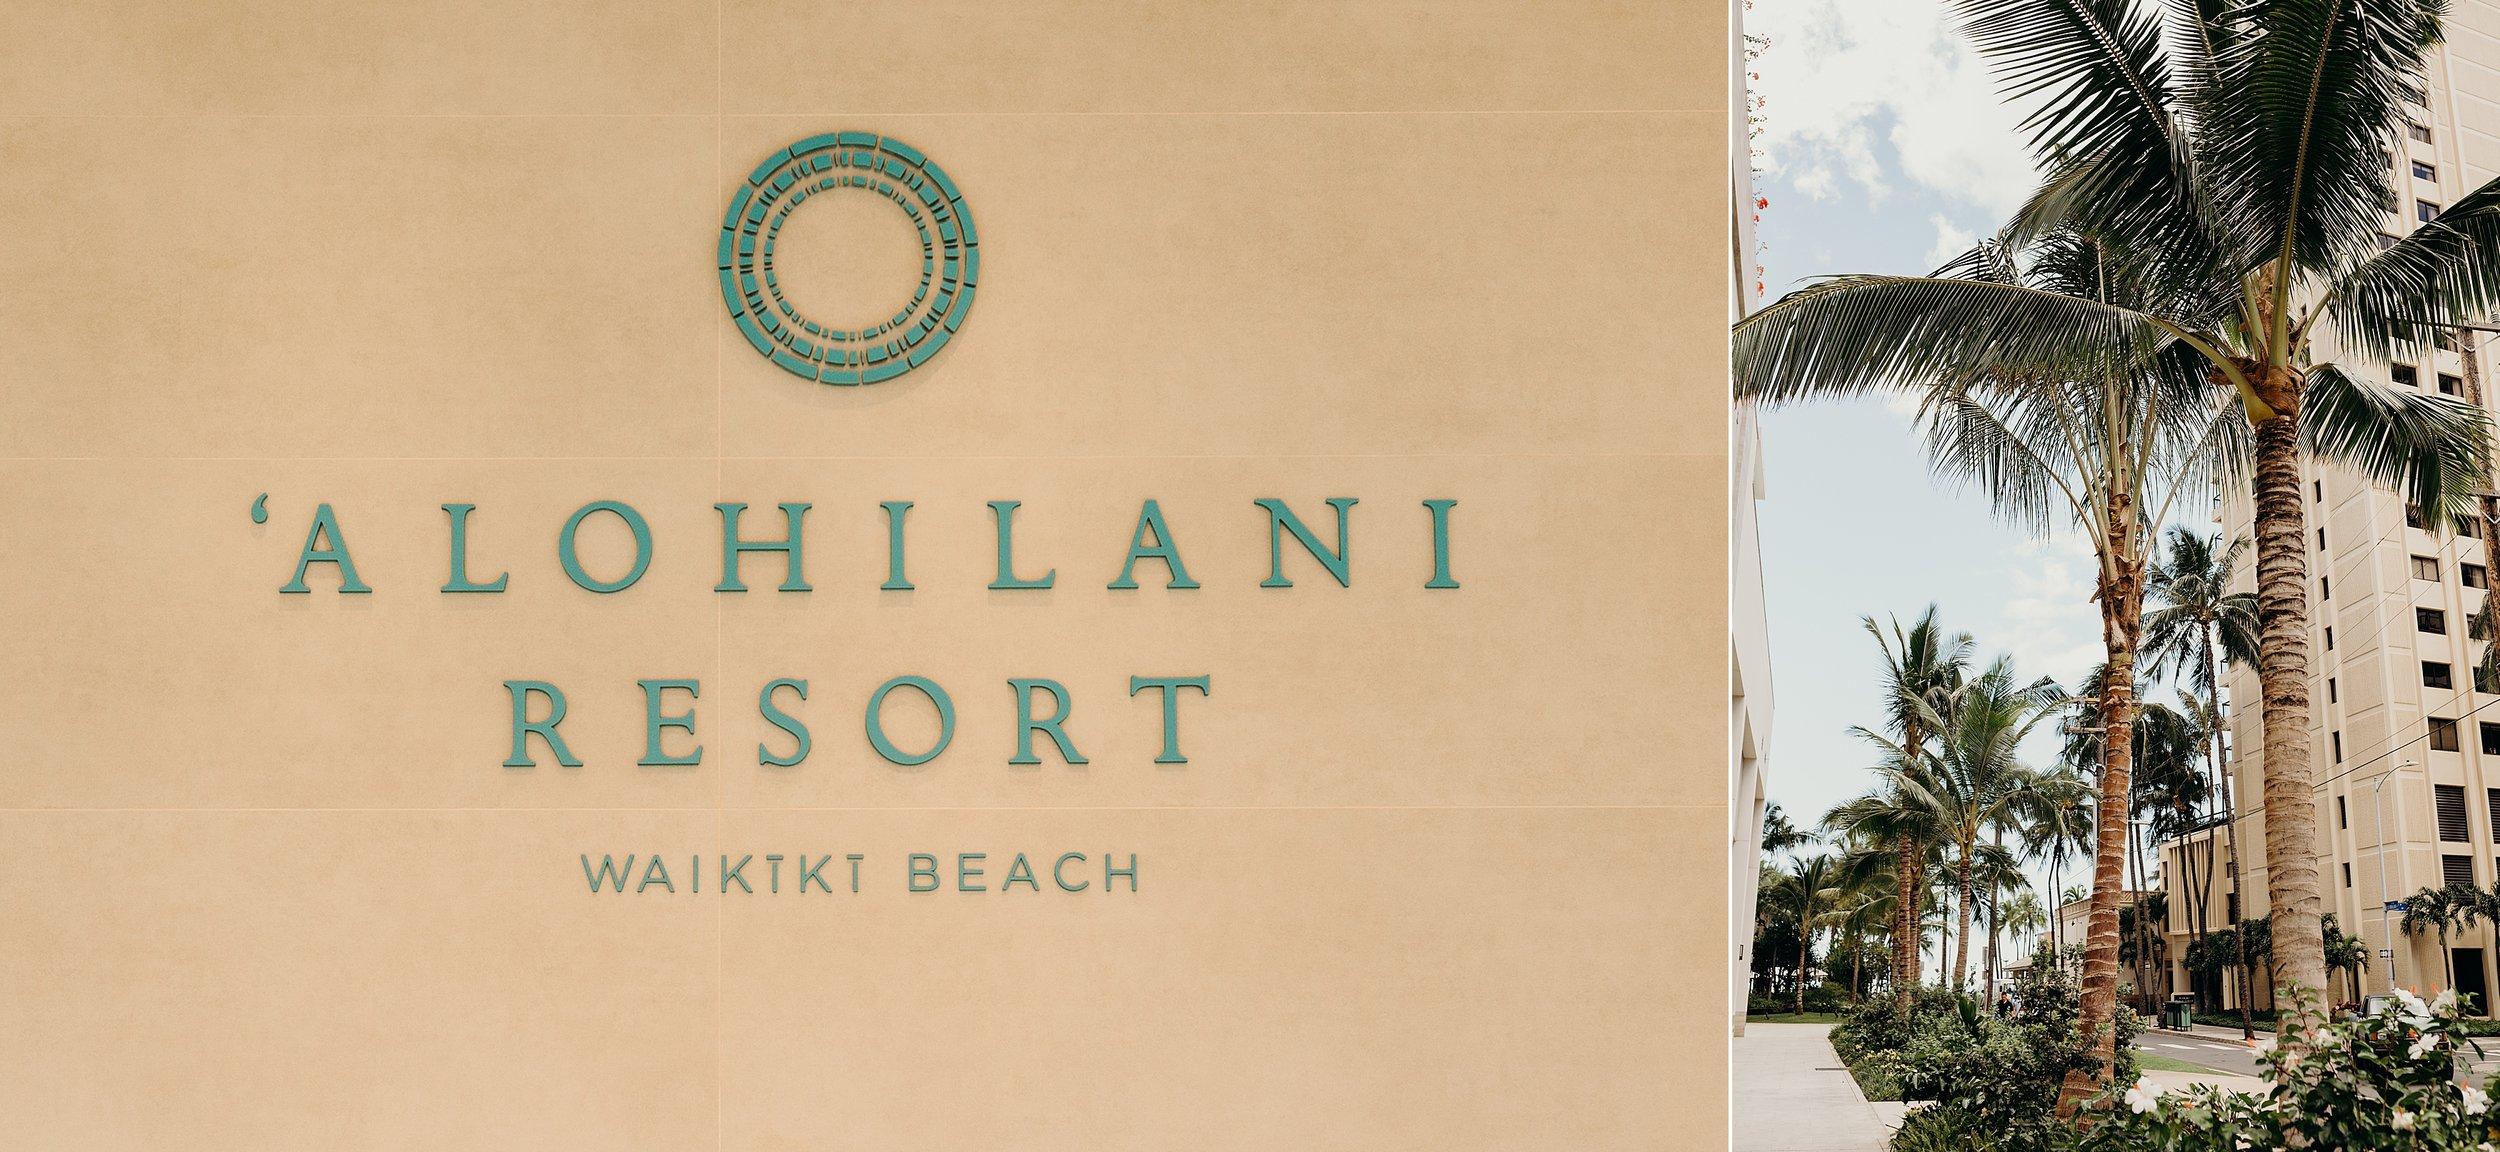 HAWAII-WEDDING-PHOTOGRAPHER-ALOHILANI-RESORT-KEANI-BAKULA_0002.jpg